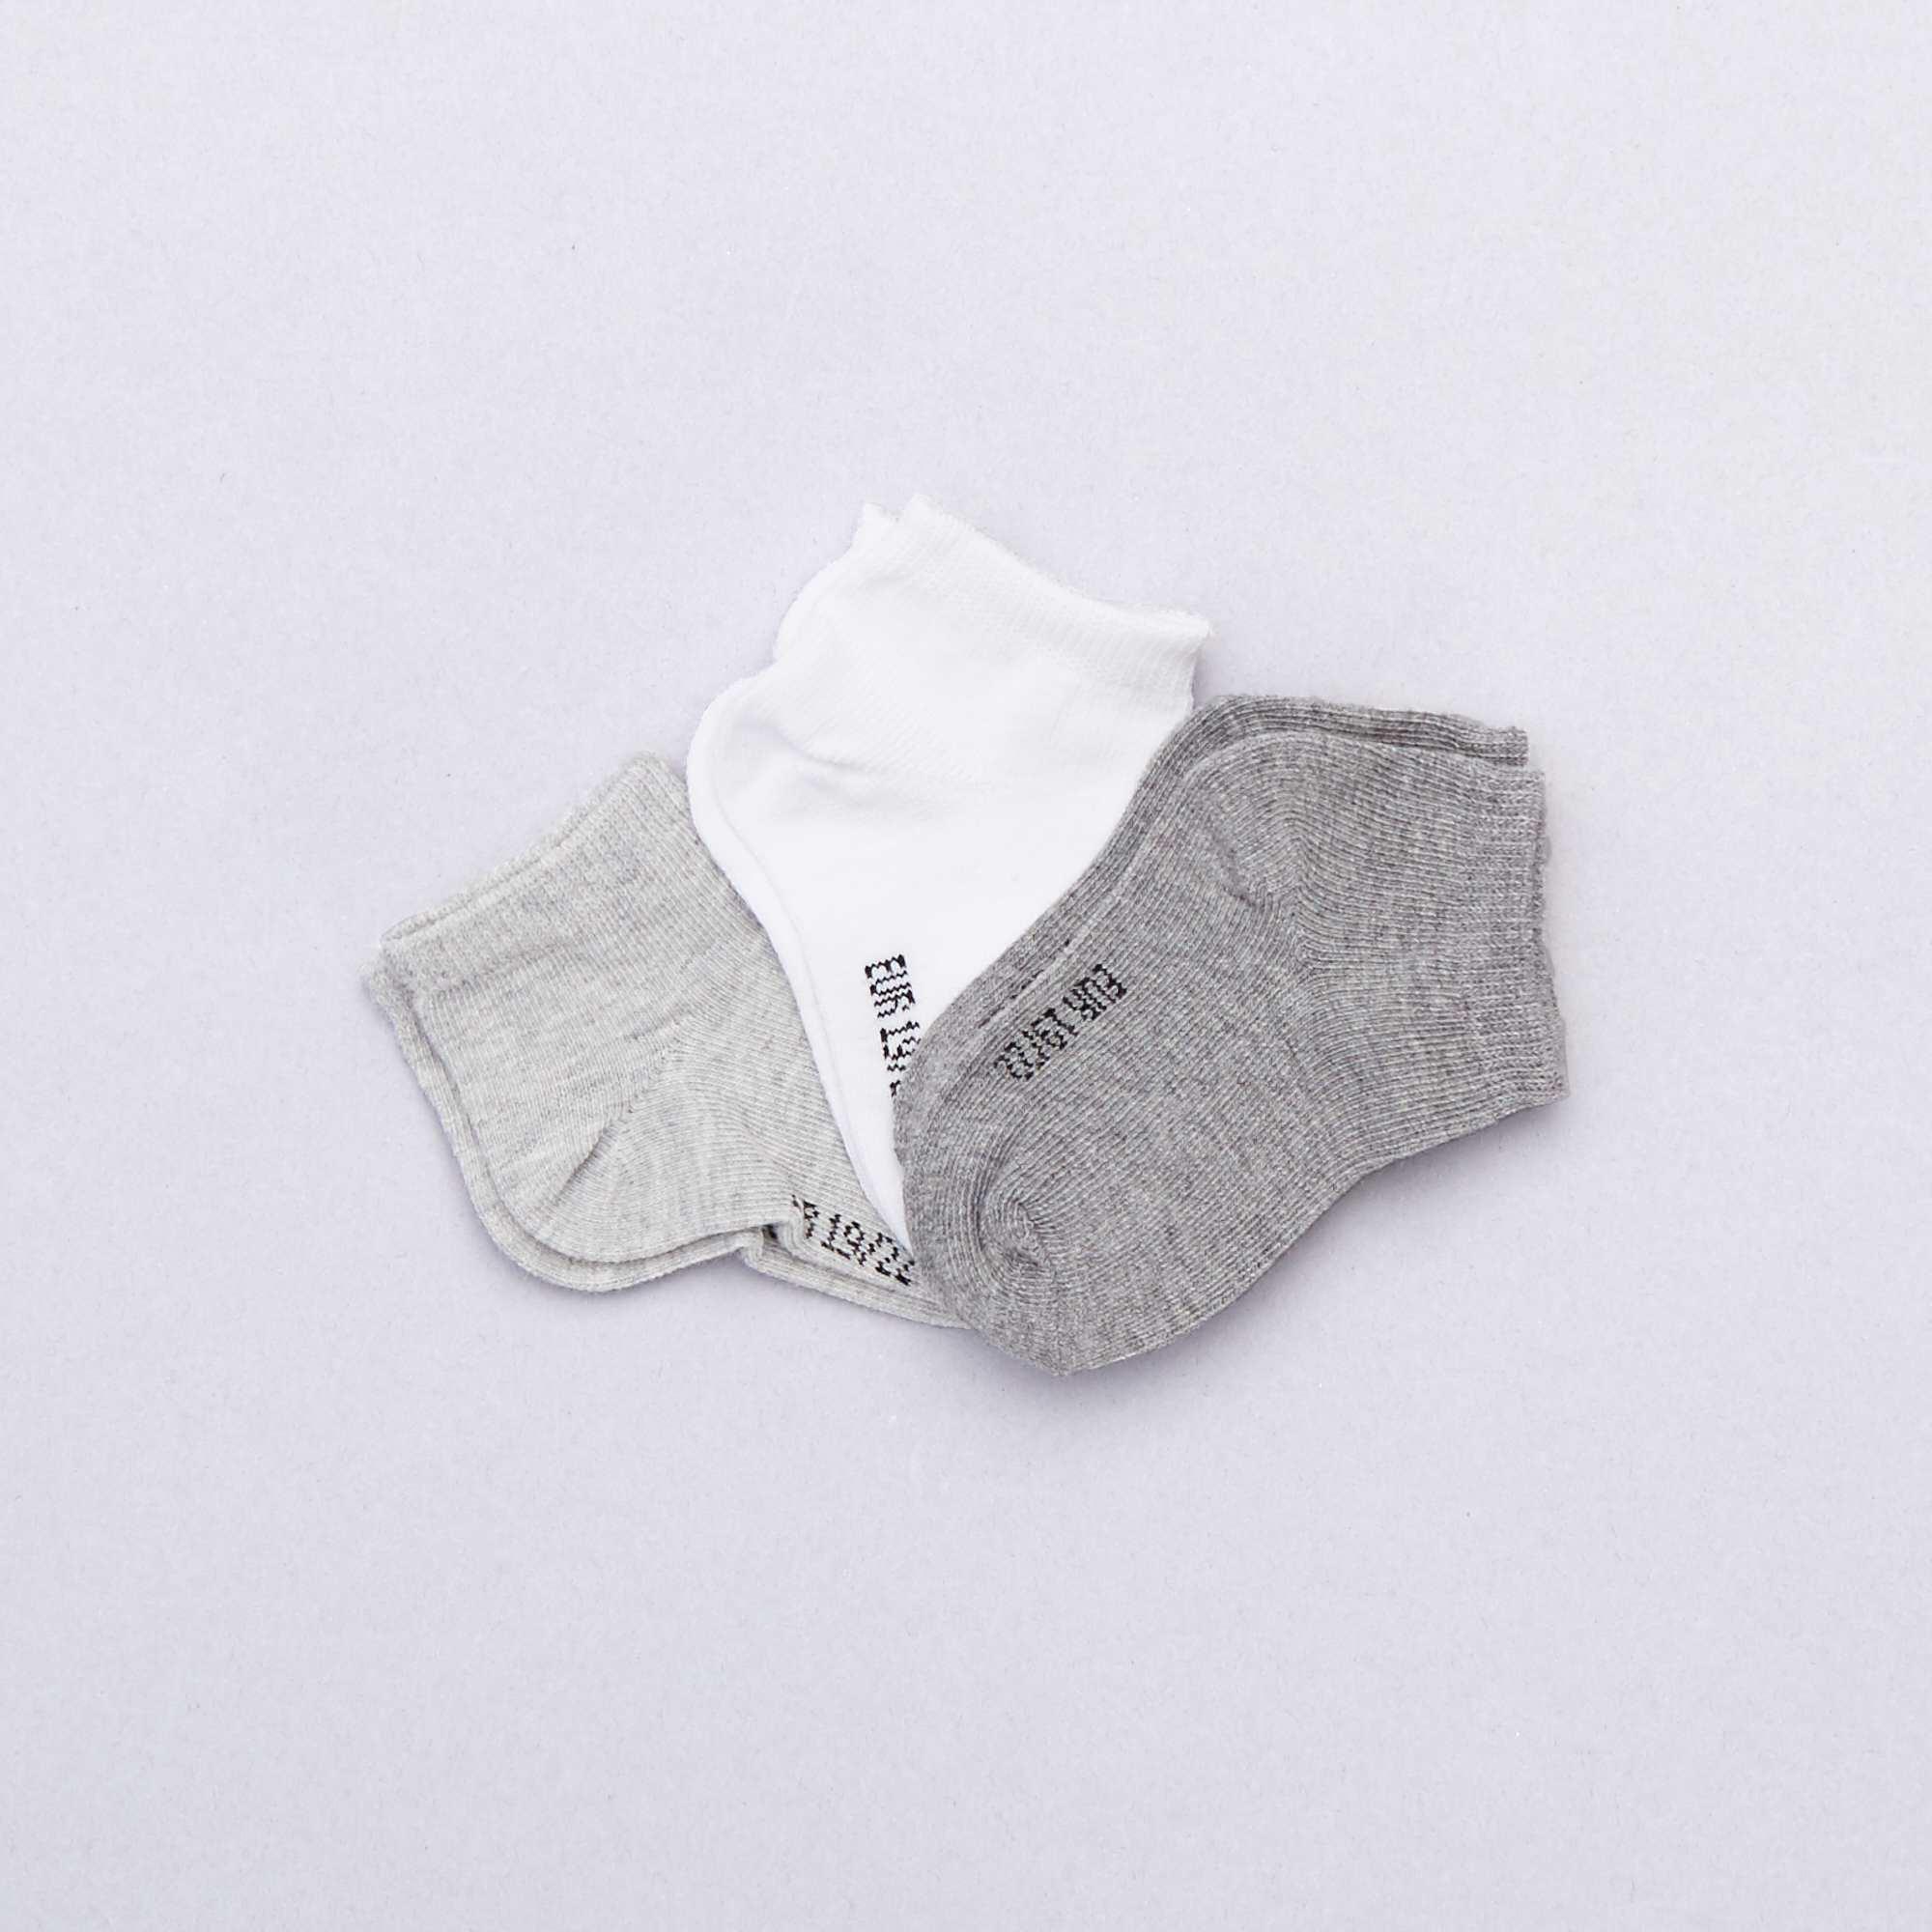 b18cd85e0 Pack de 3 pares calcetines invisibles lisos GRIS Bebé niño. Loading zoom